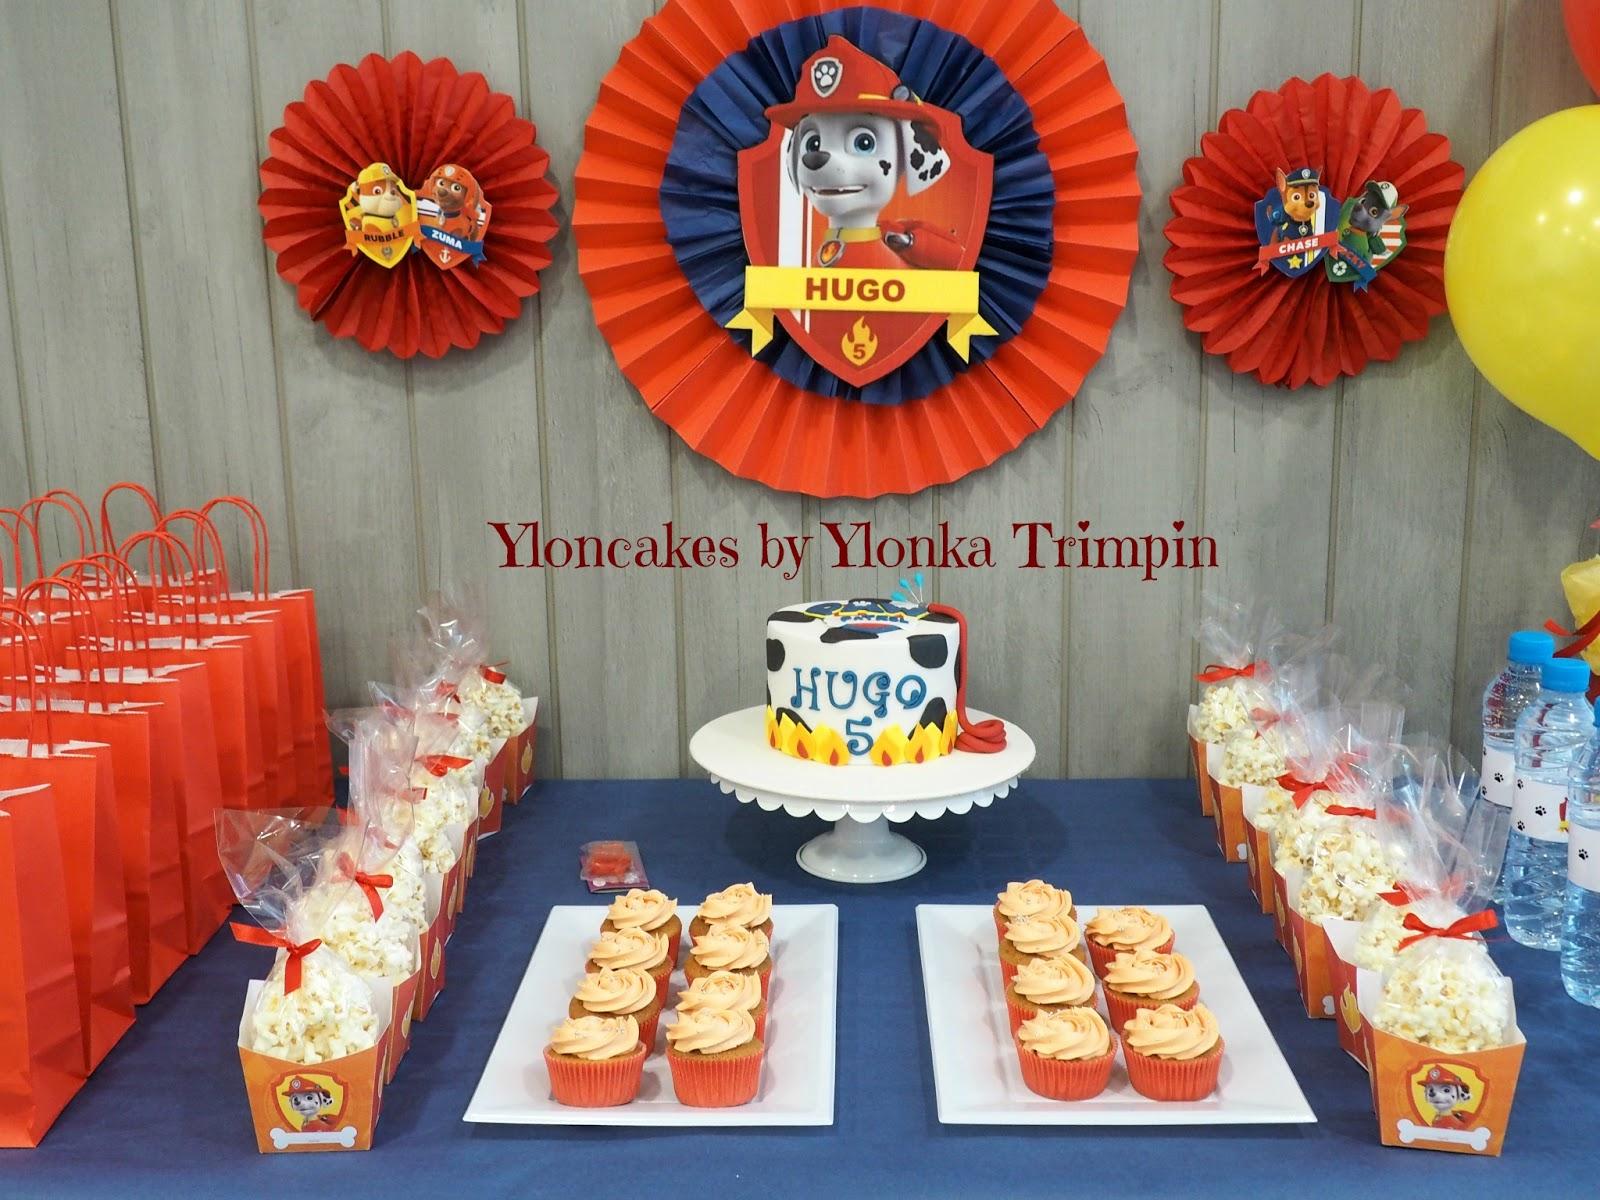 Yloncakes mesa dulce patrulla canina - Decoracion de la patrulla canina ...